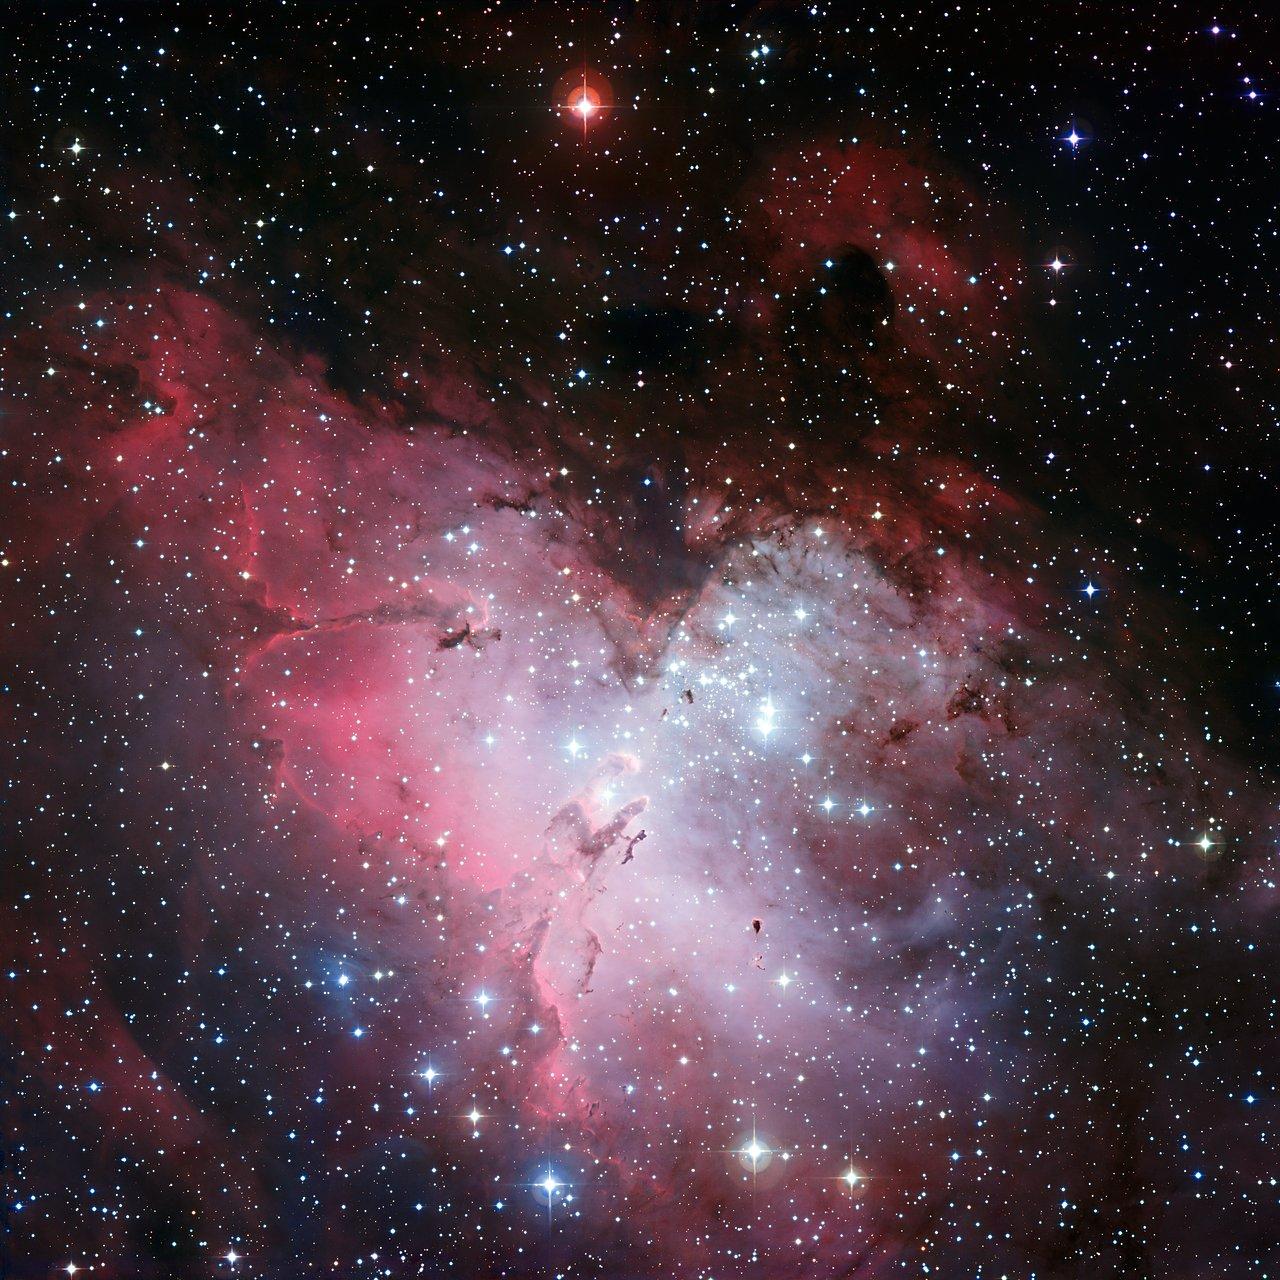 Mounted image 137: The Eagle Nebula and the Pillars of Creation